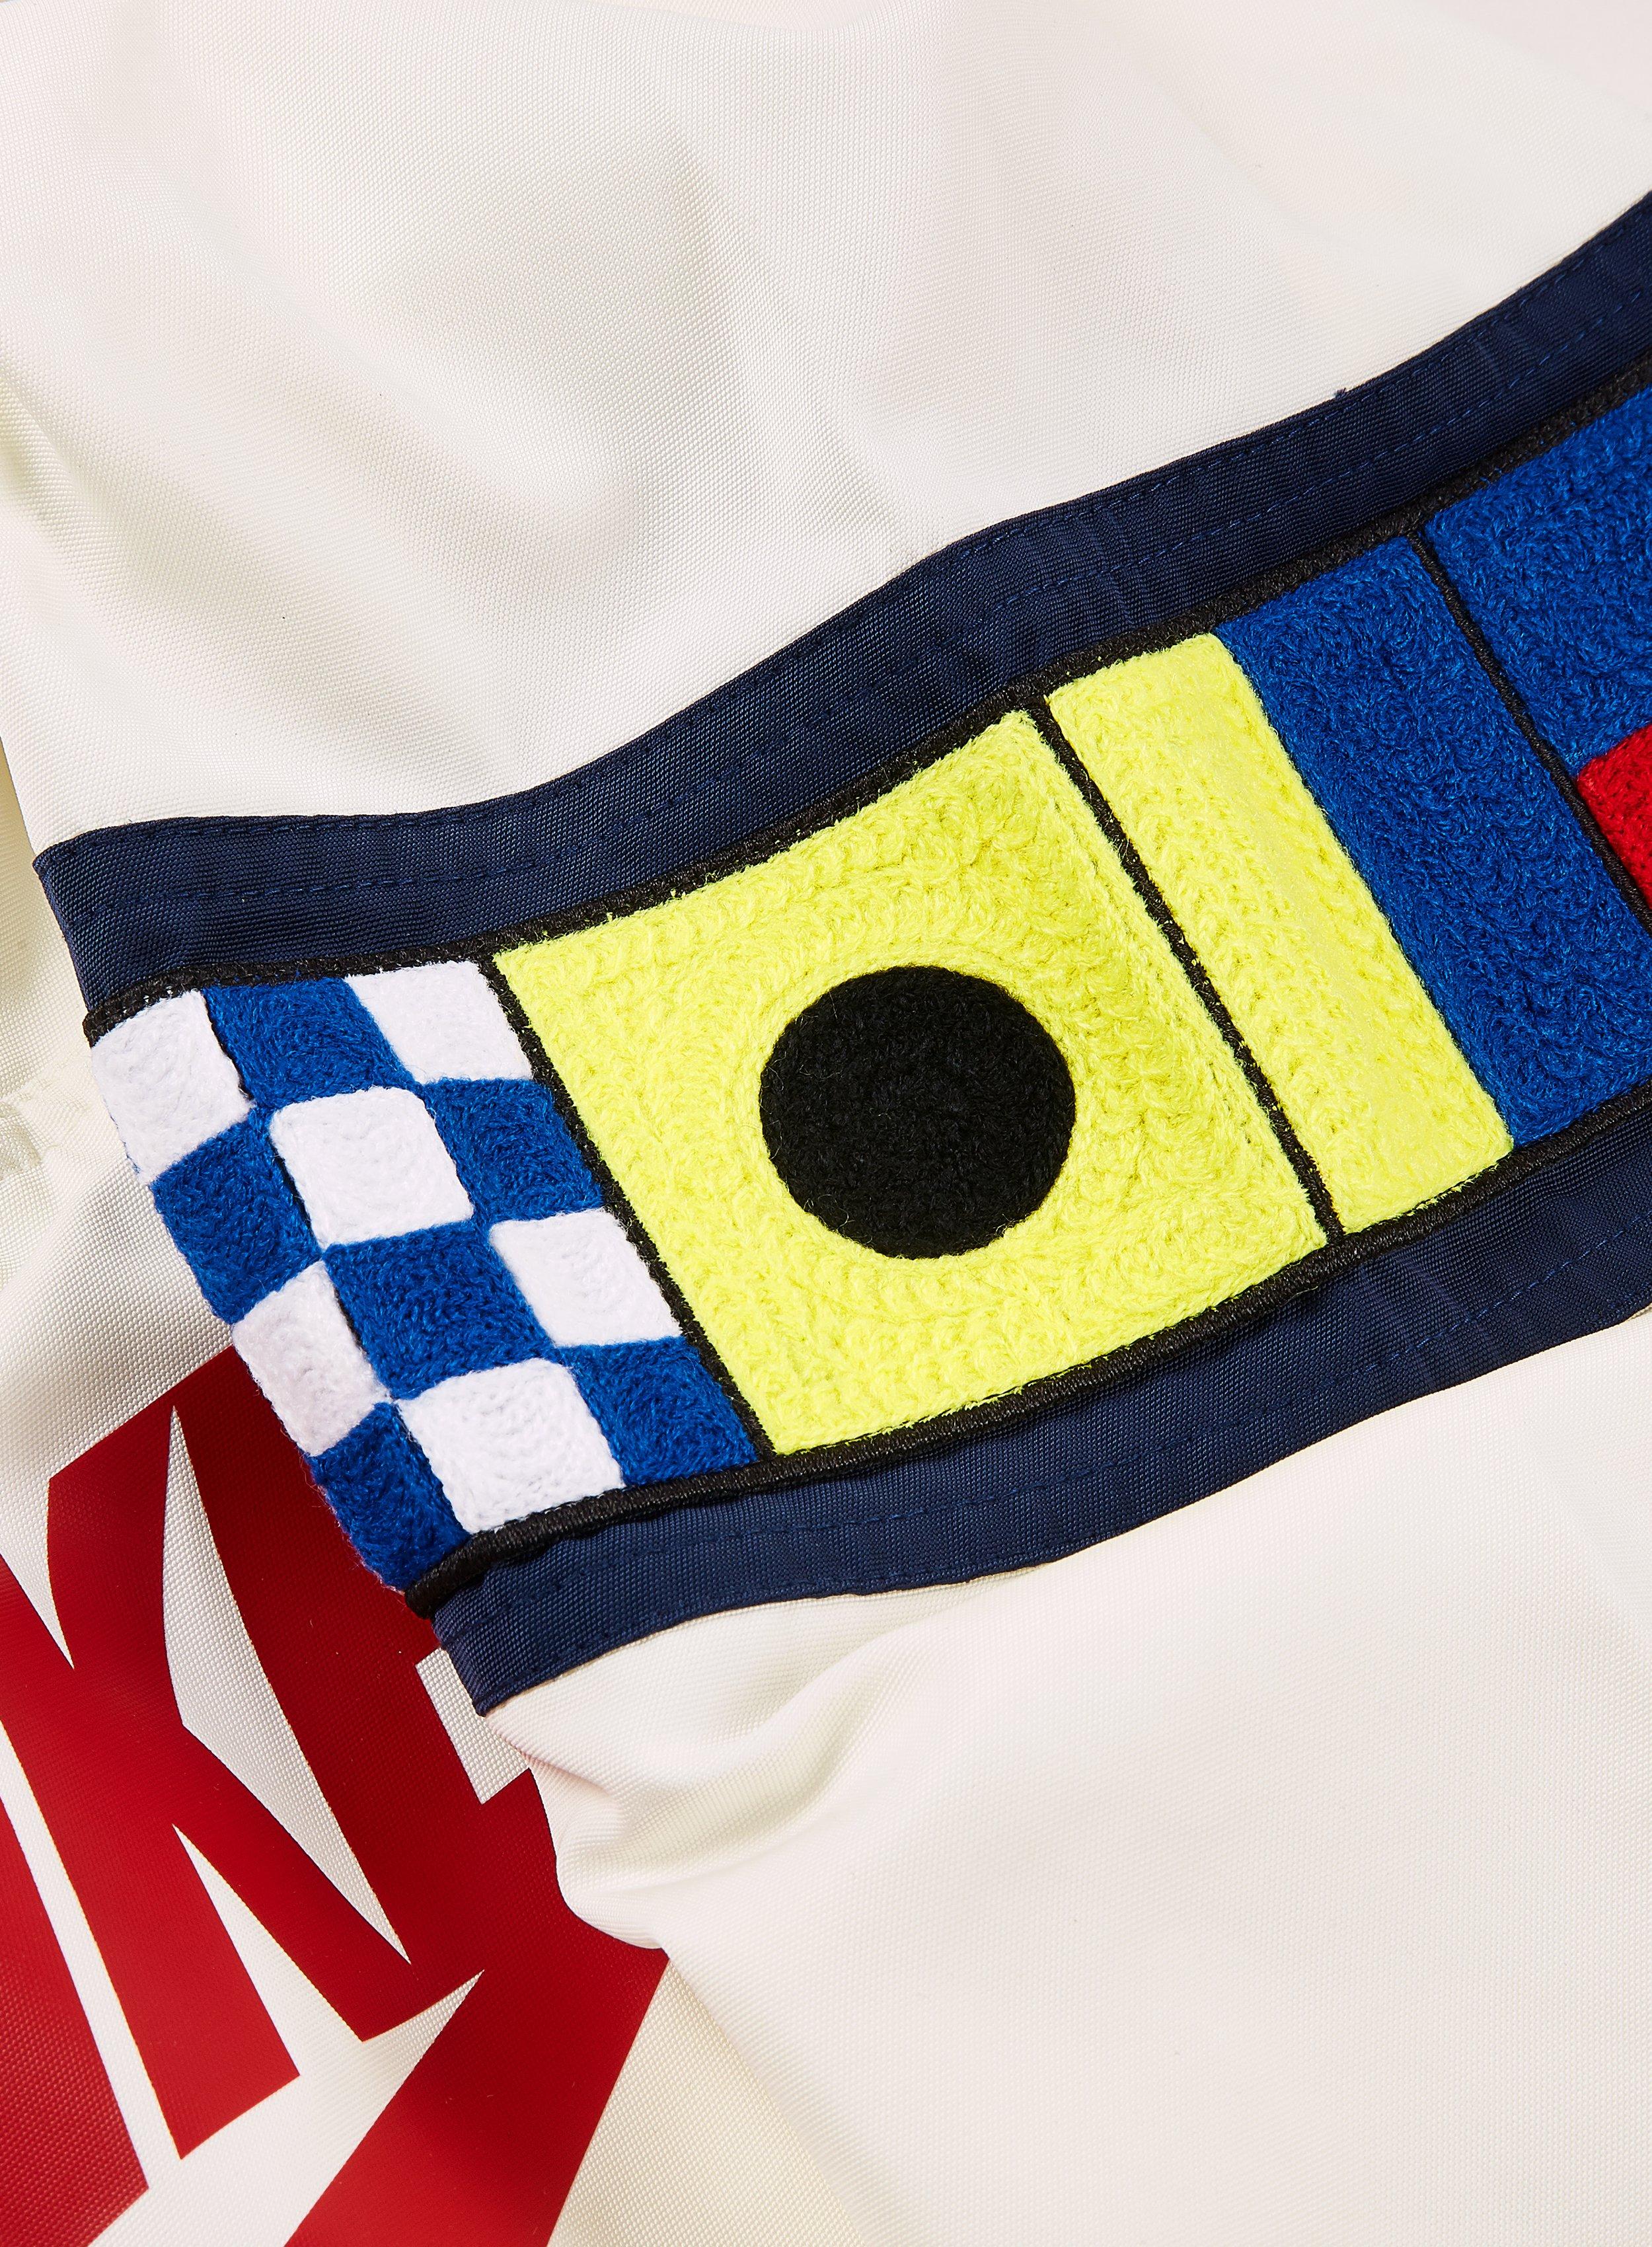 giacche-nike-nsw-reissue-walliwaw-woven-jacket-sail-midnight-navy-midnight-navy-302270-2500-6.jpg